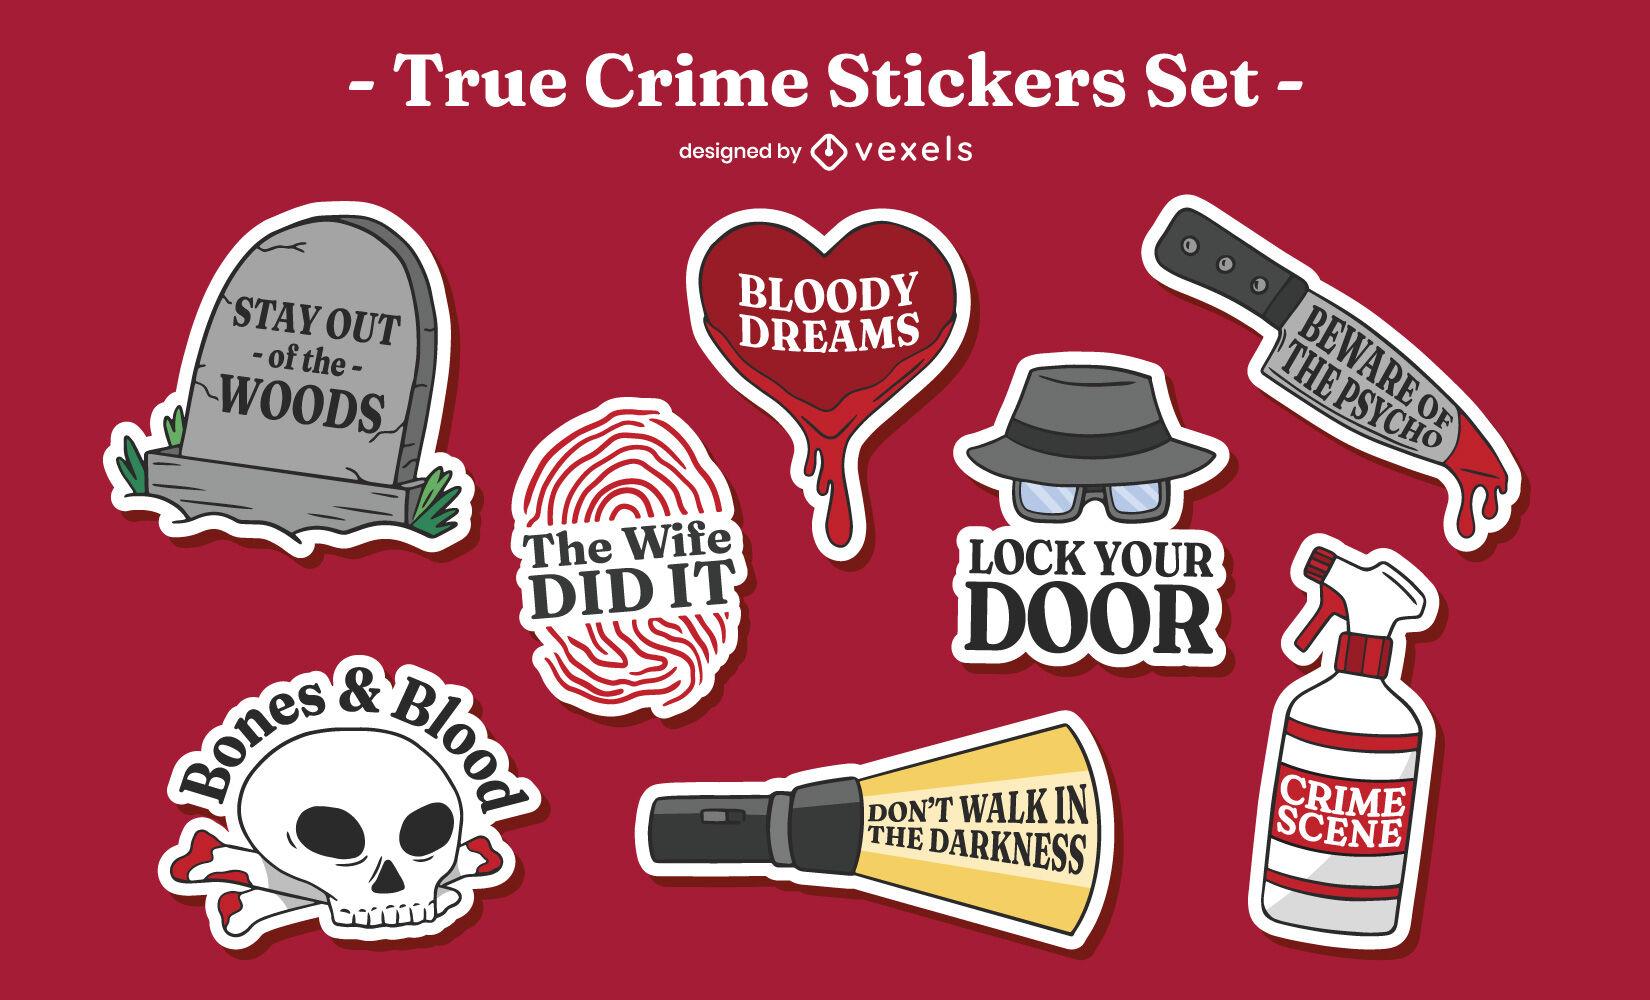 Halloween true crimes quotes sticker set